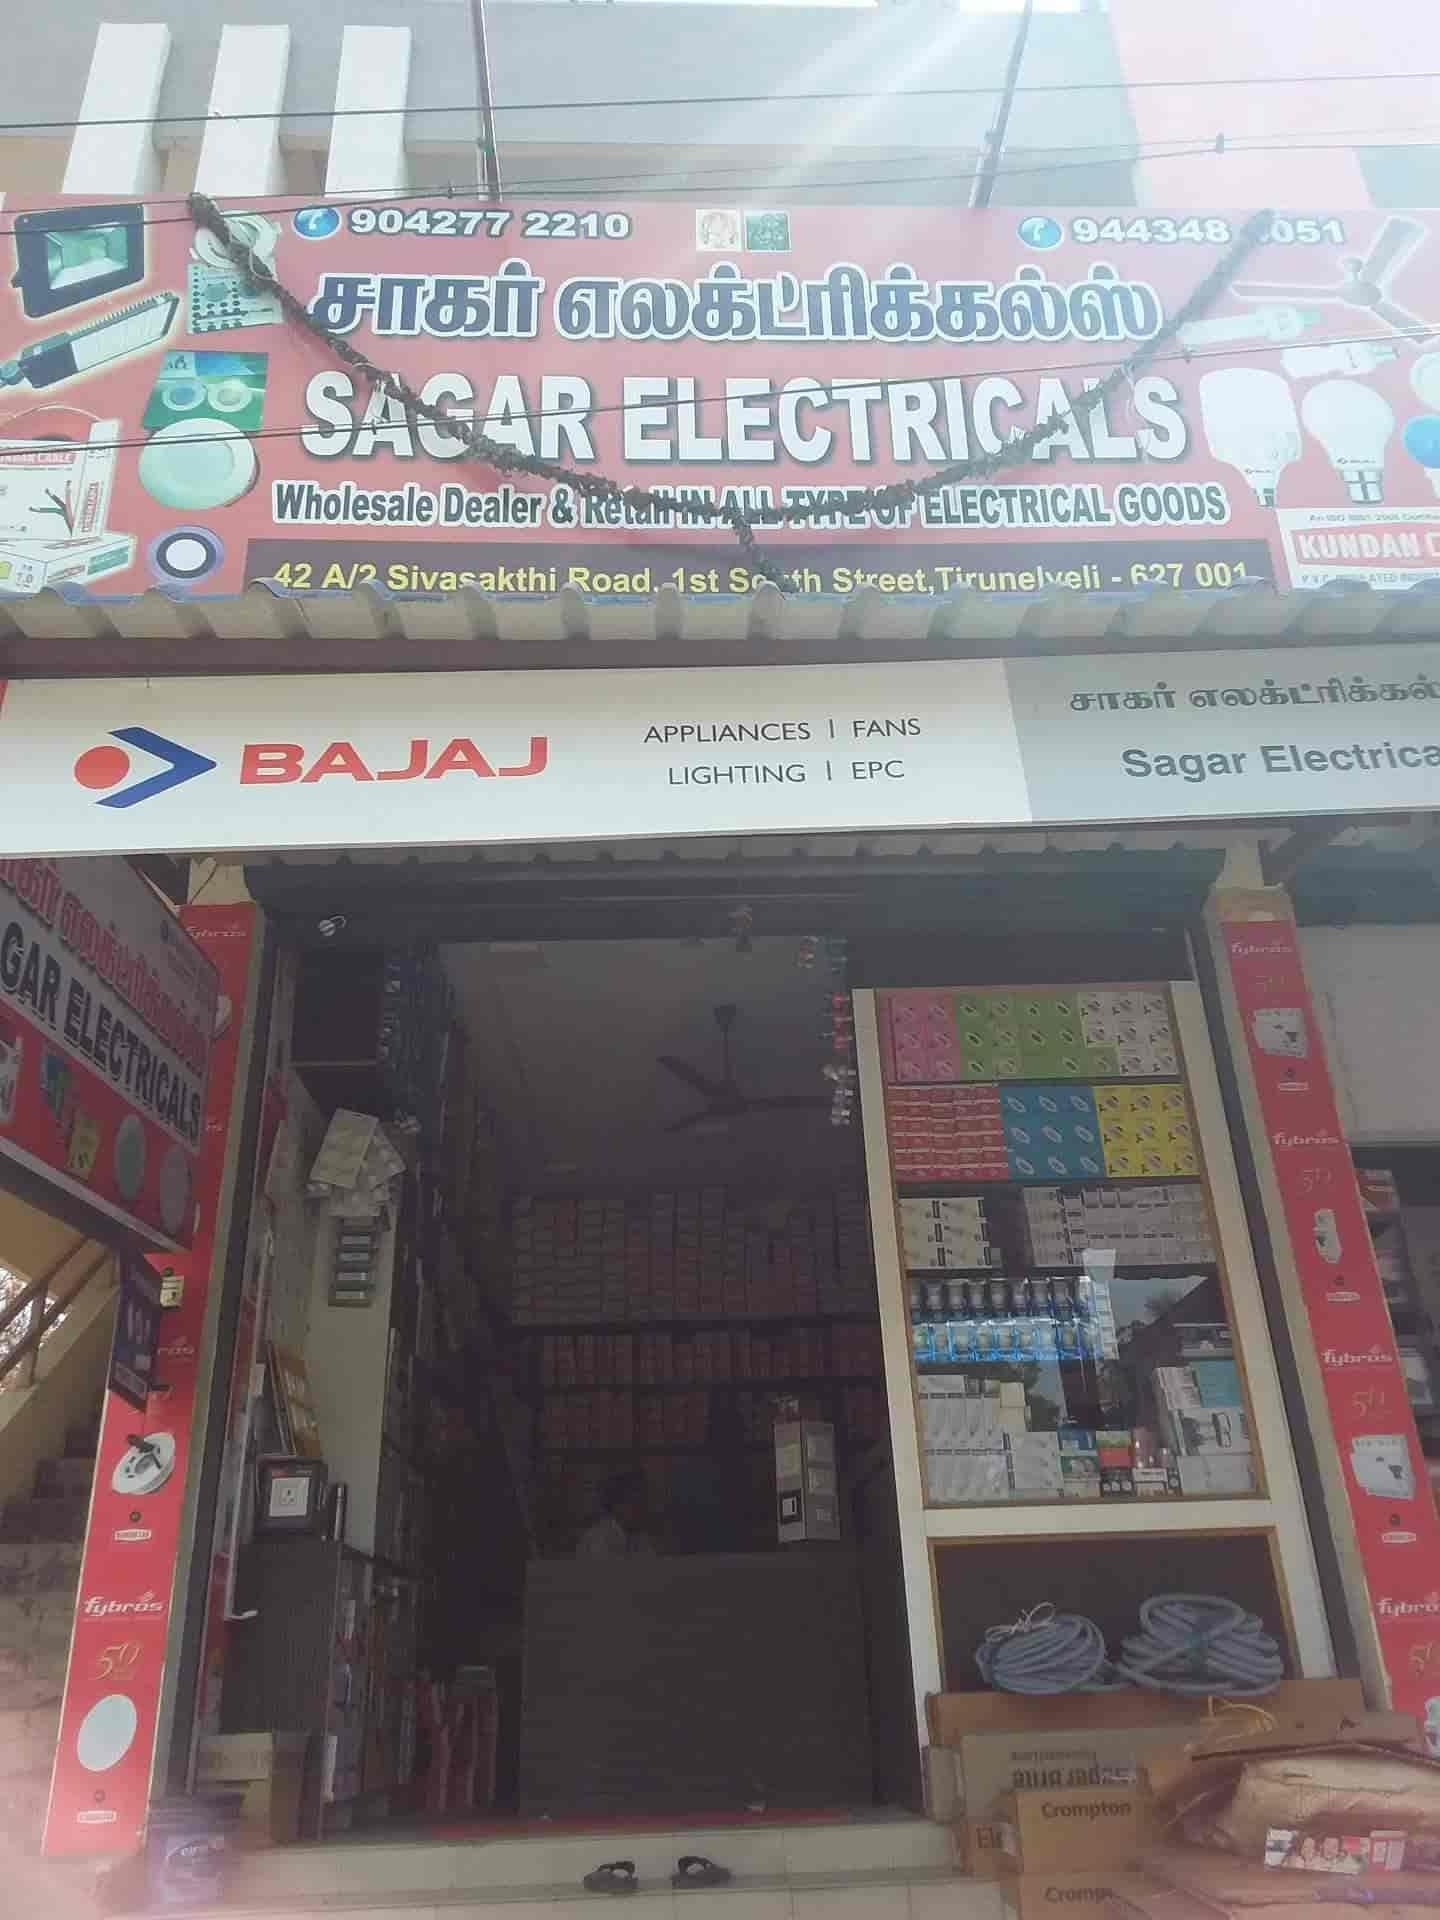 Sagar Electricals, Junction - Electrical Shops in Tirunelveli - Justdial